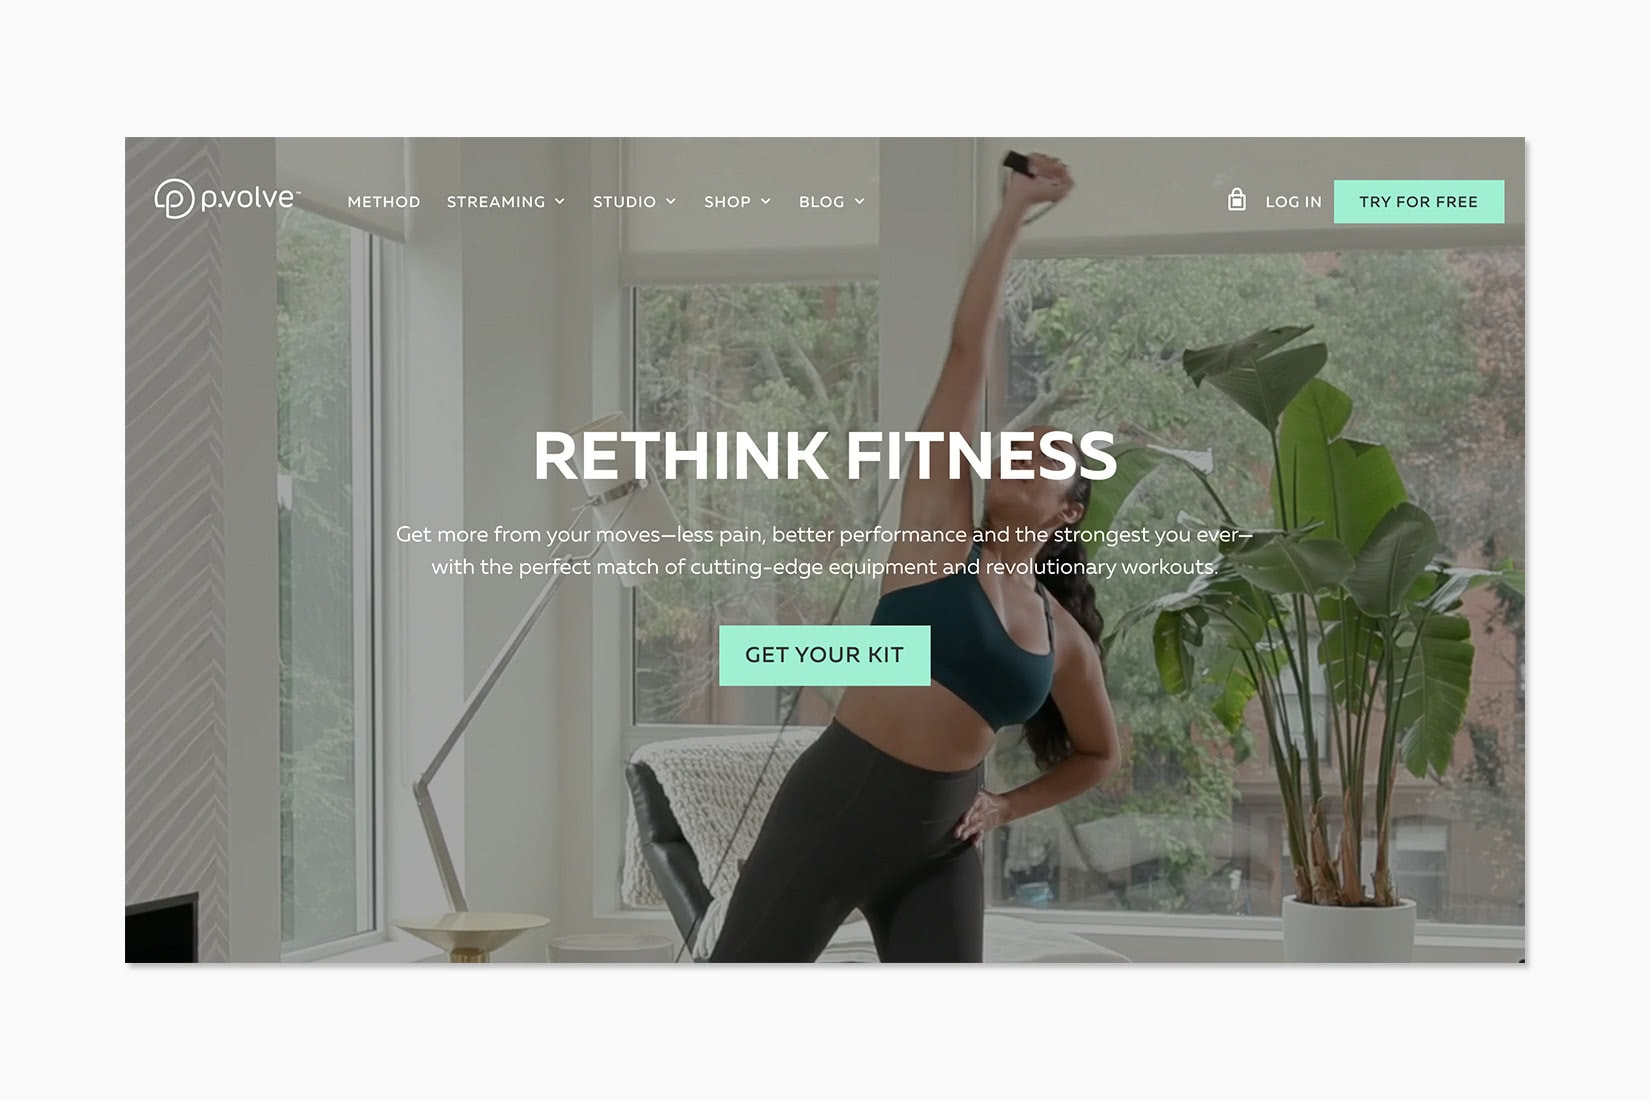 best online workout program p.volve review - Luxe Digital